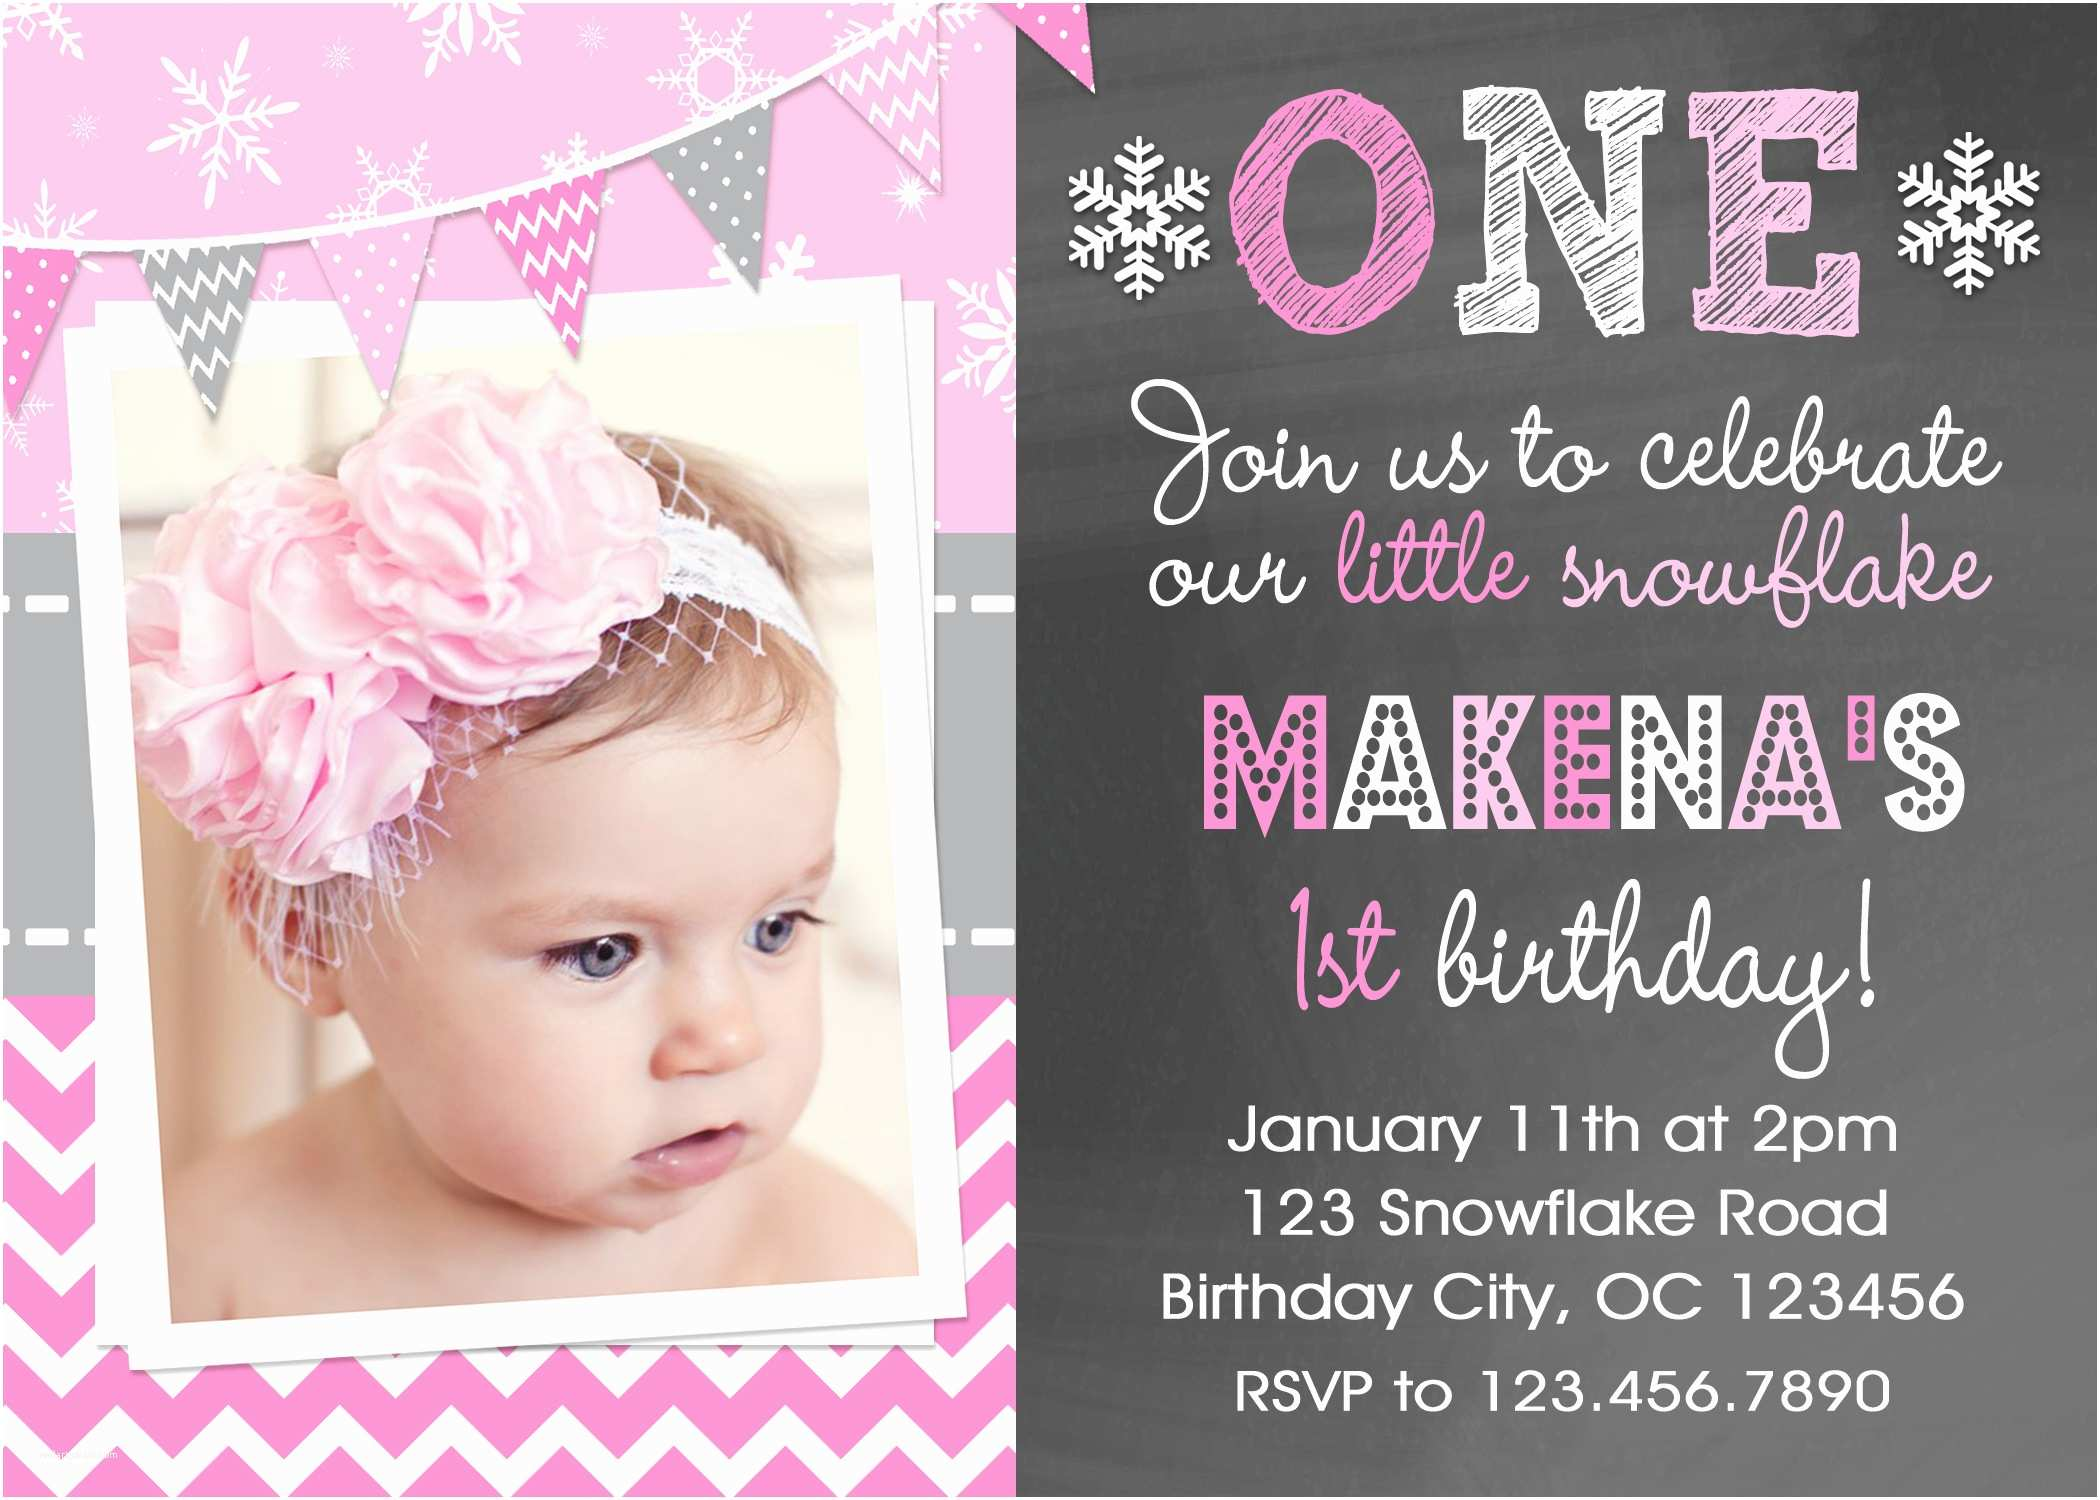 Girls Birthday Party Invitations Snowflake Printable Birthday Invitations Girls Winter